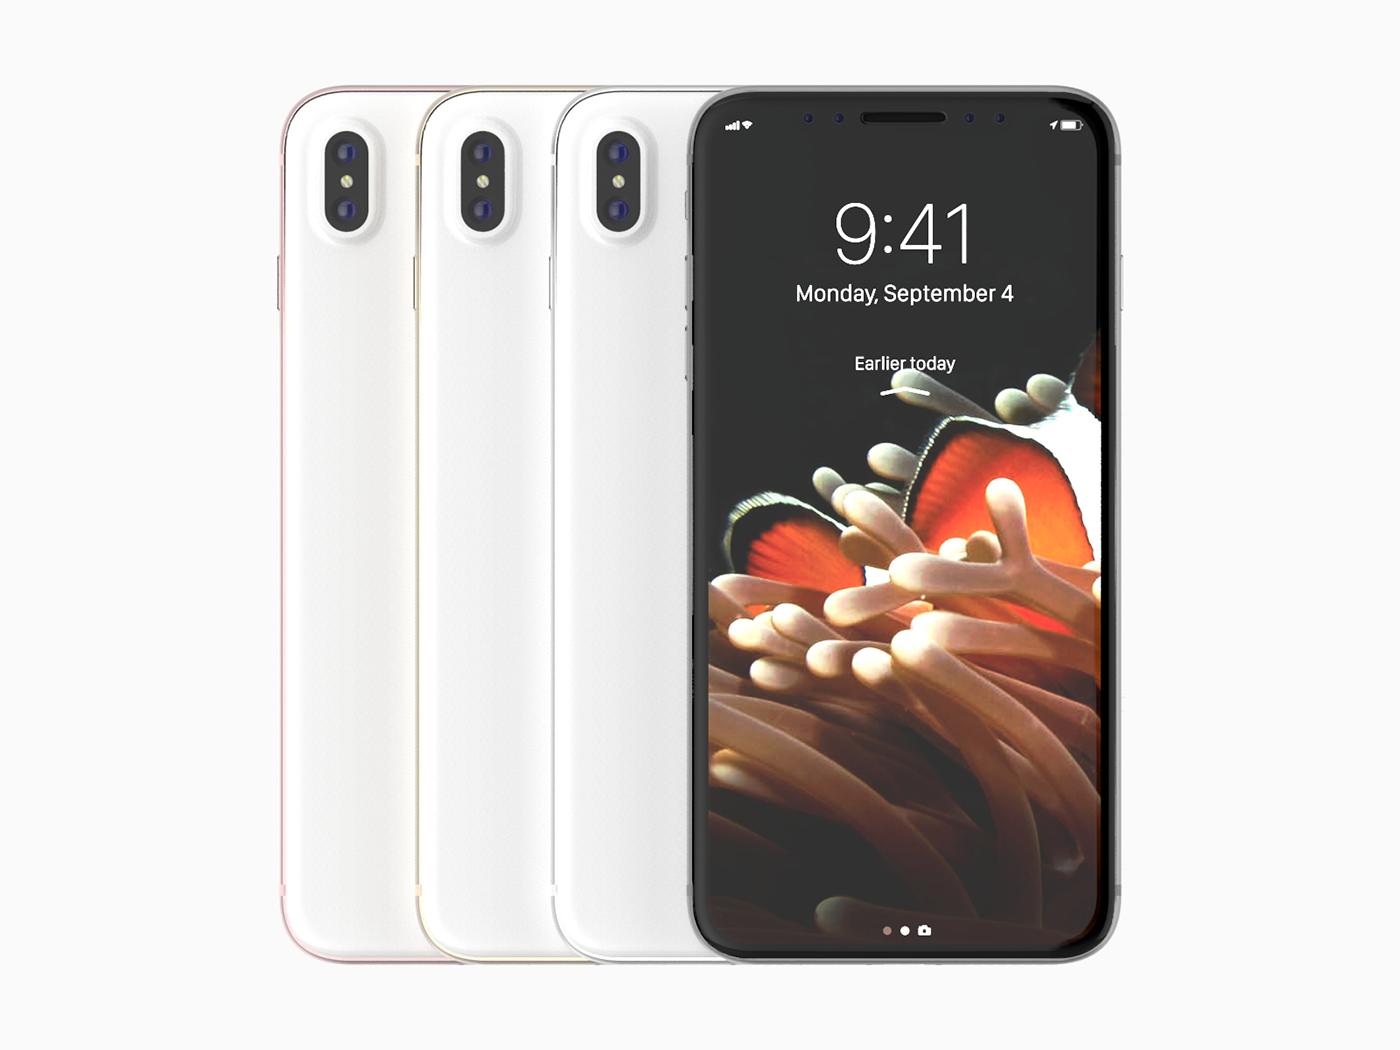 iphone,iphone 8,apple,minimalistic,aluminum,glass,anodized,black,White,Rose Gold